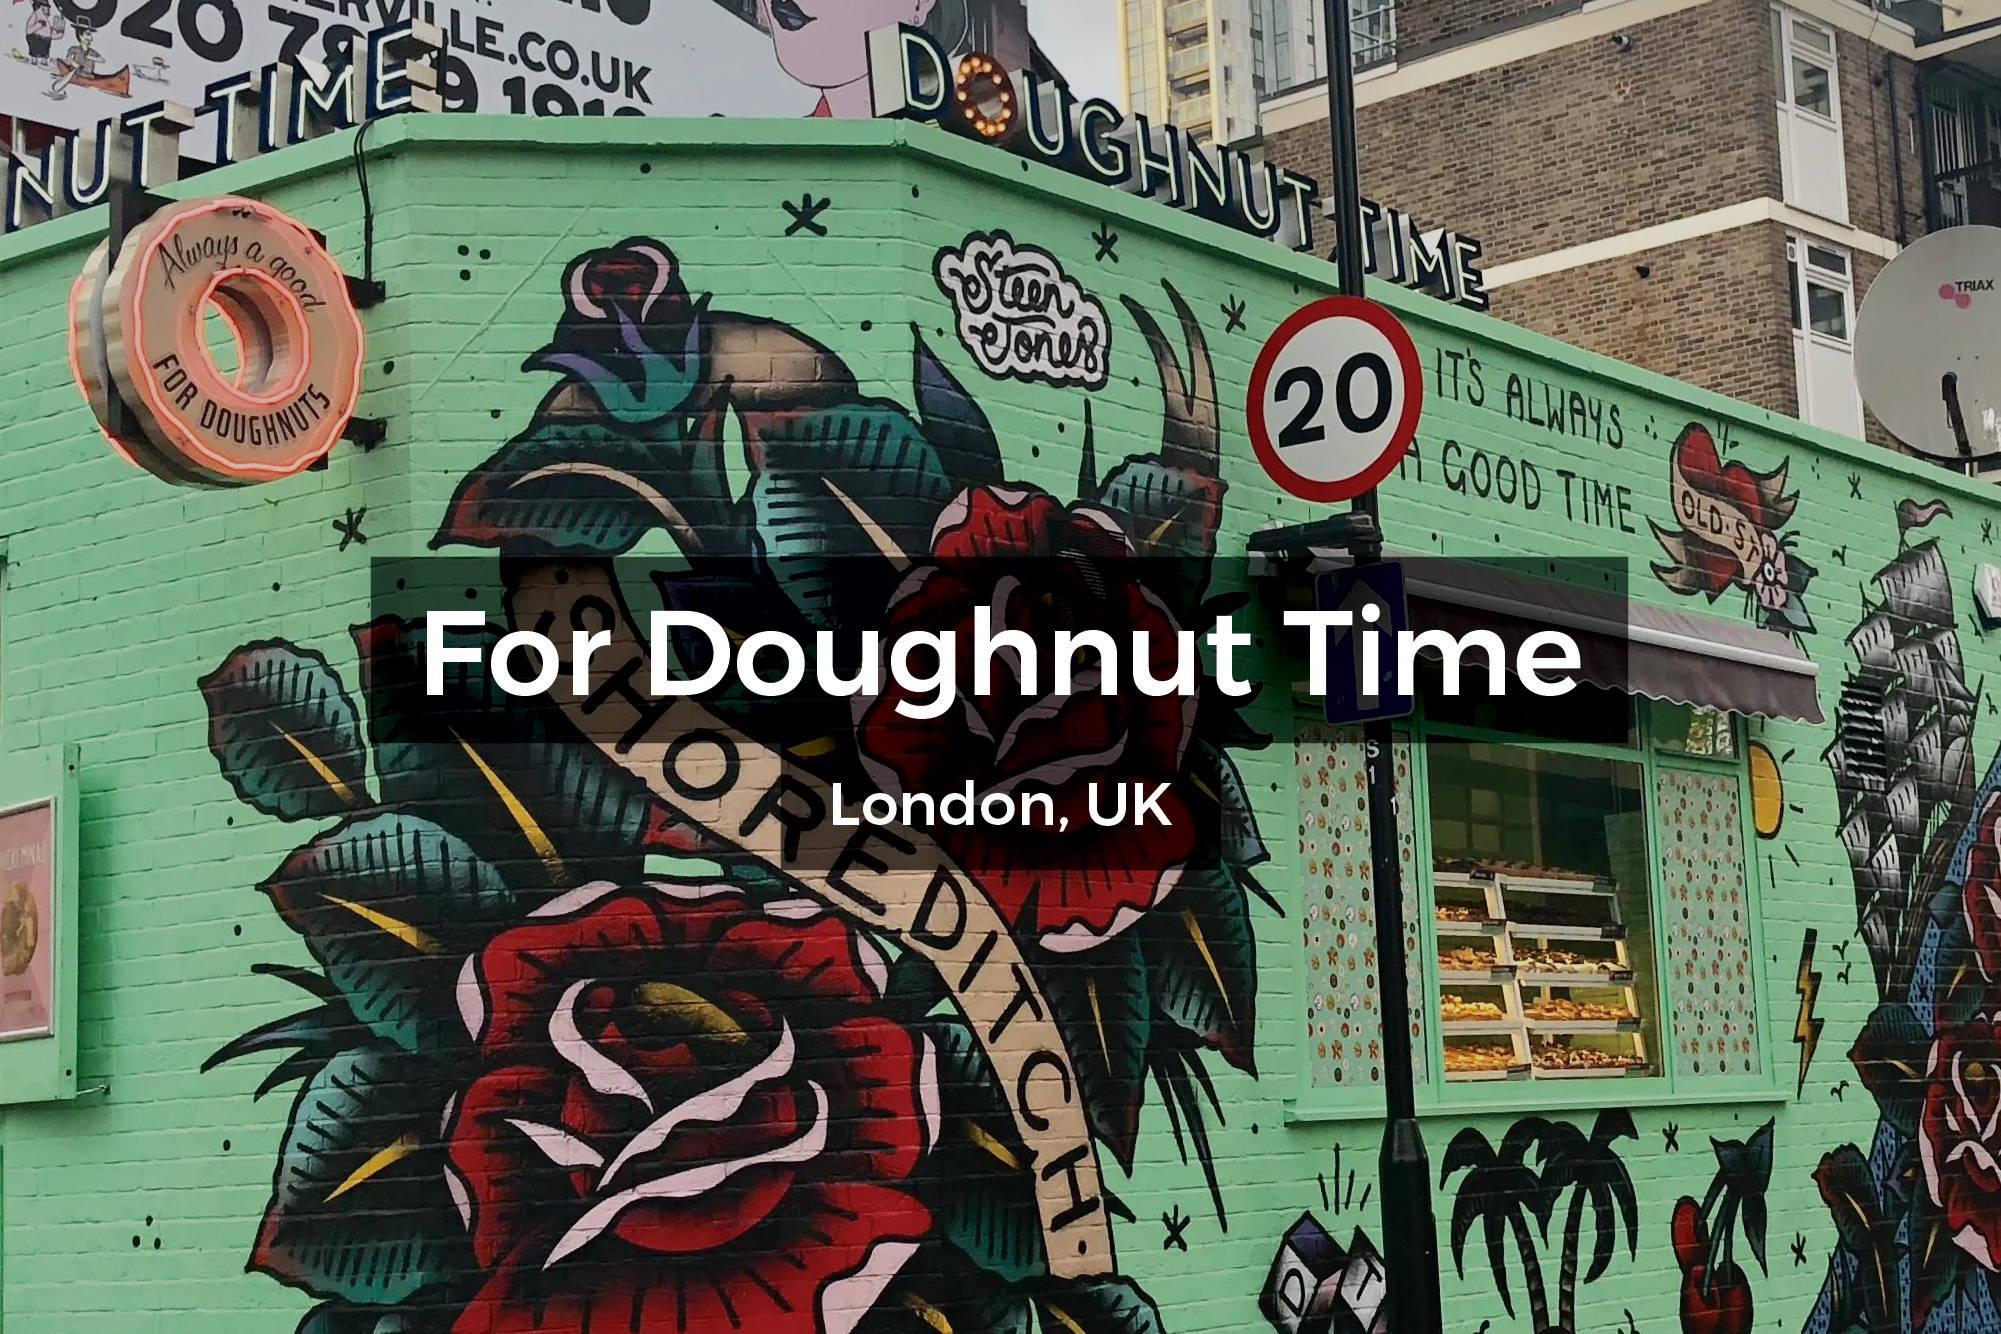 Doughnut Time mural in Shoreditch, London UK by Steen Jones